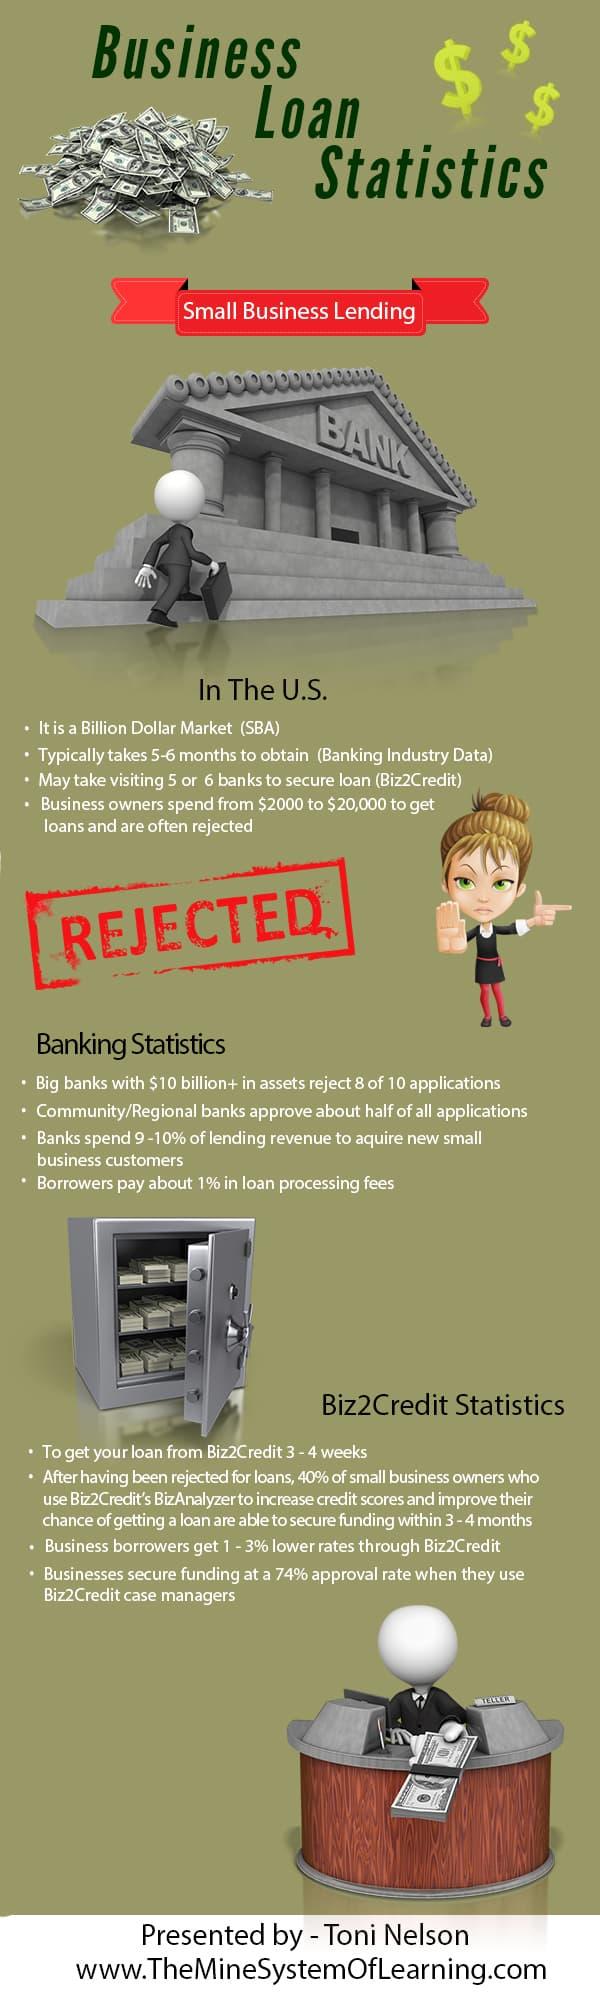 business loan statistics infographic